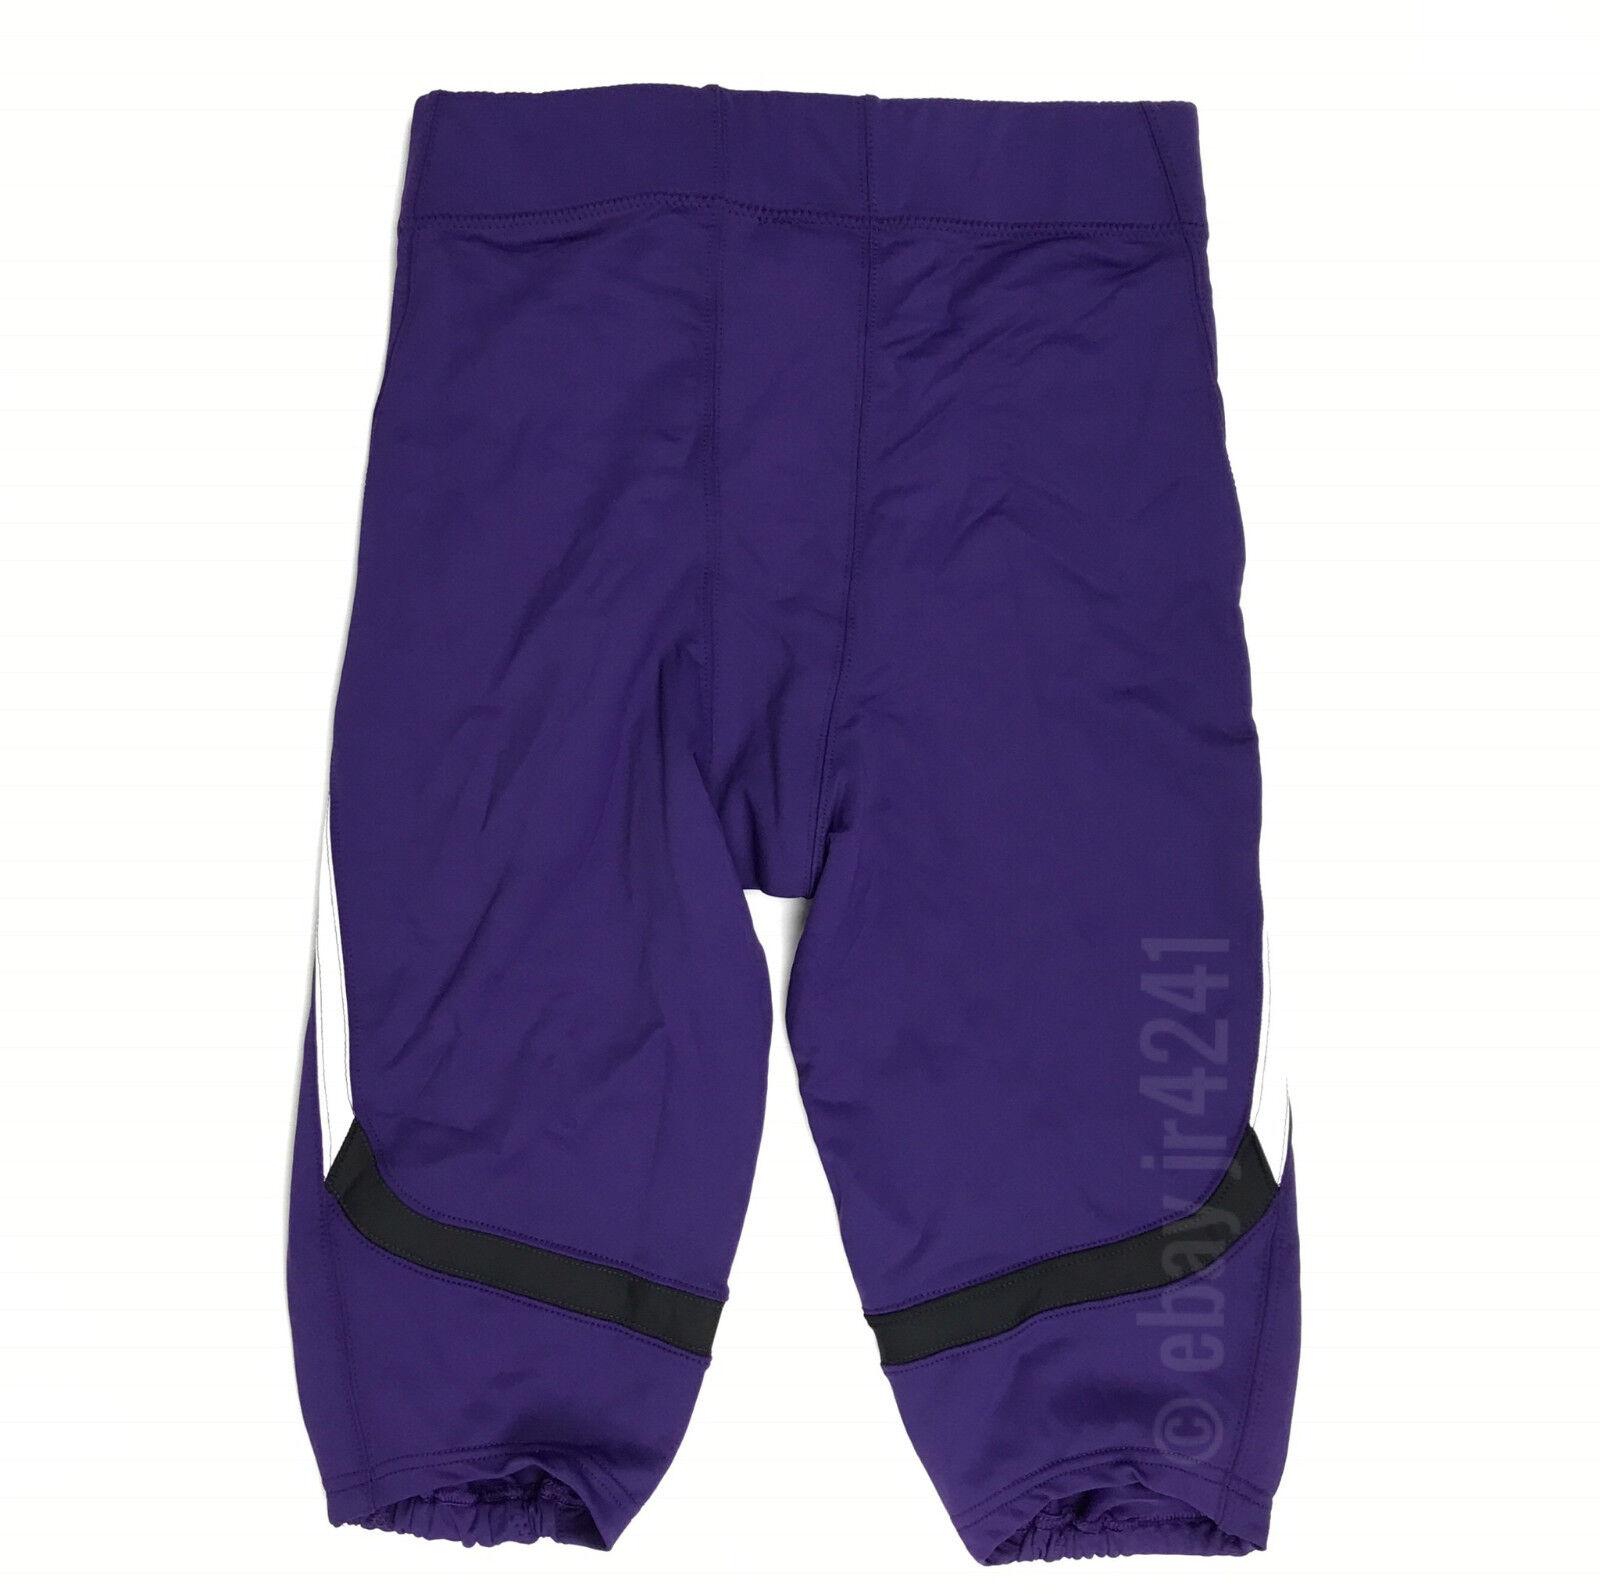 New Under Armour Renegade Football Game Pant Men/'s L Purple Northwestern